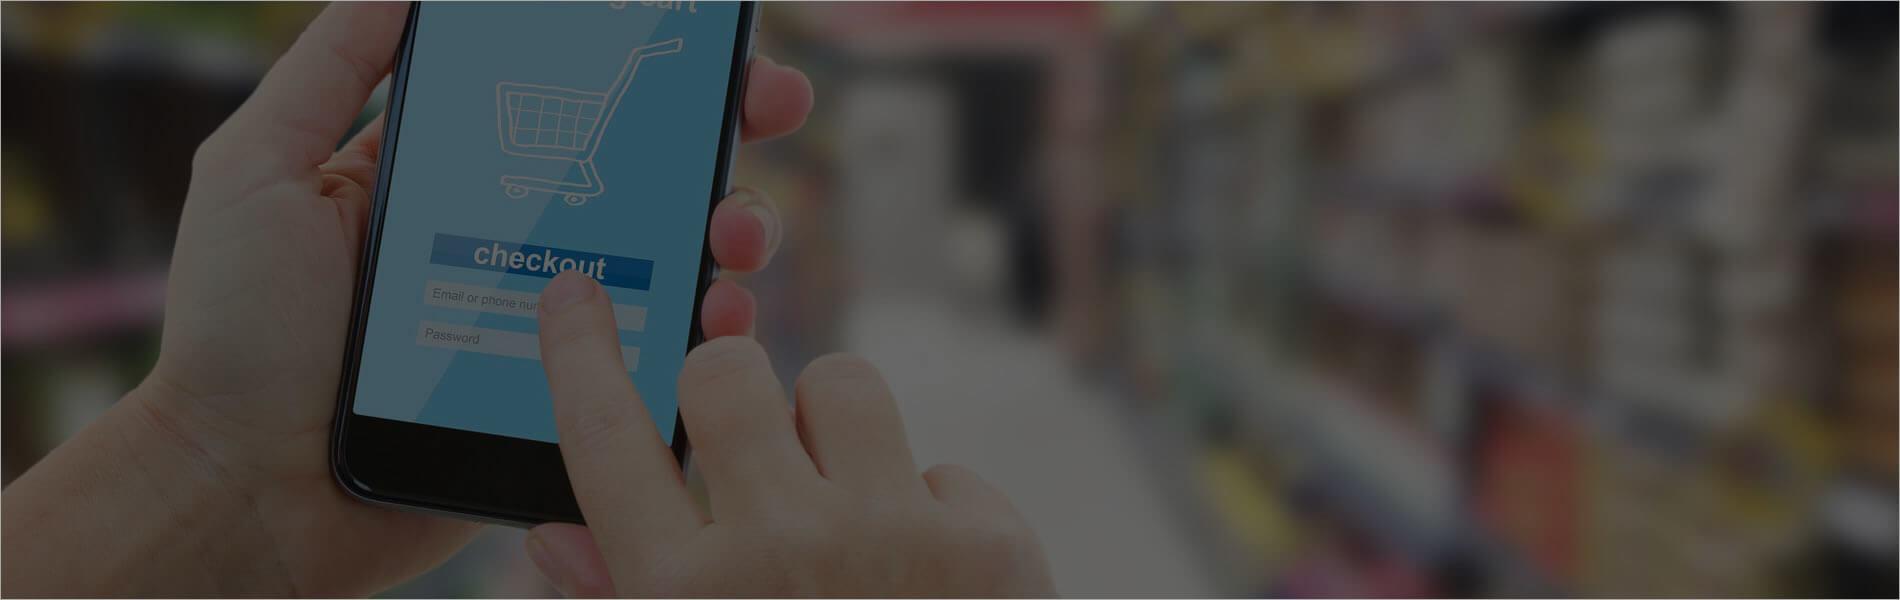 eCommerce ⁄ mCommerce Solutions